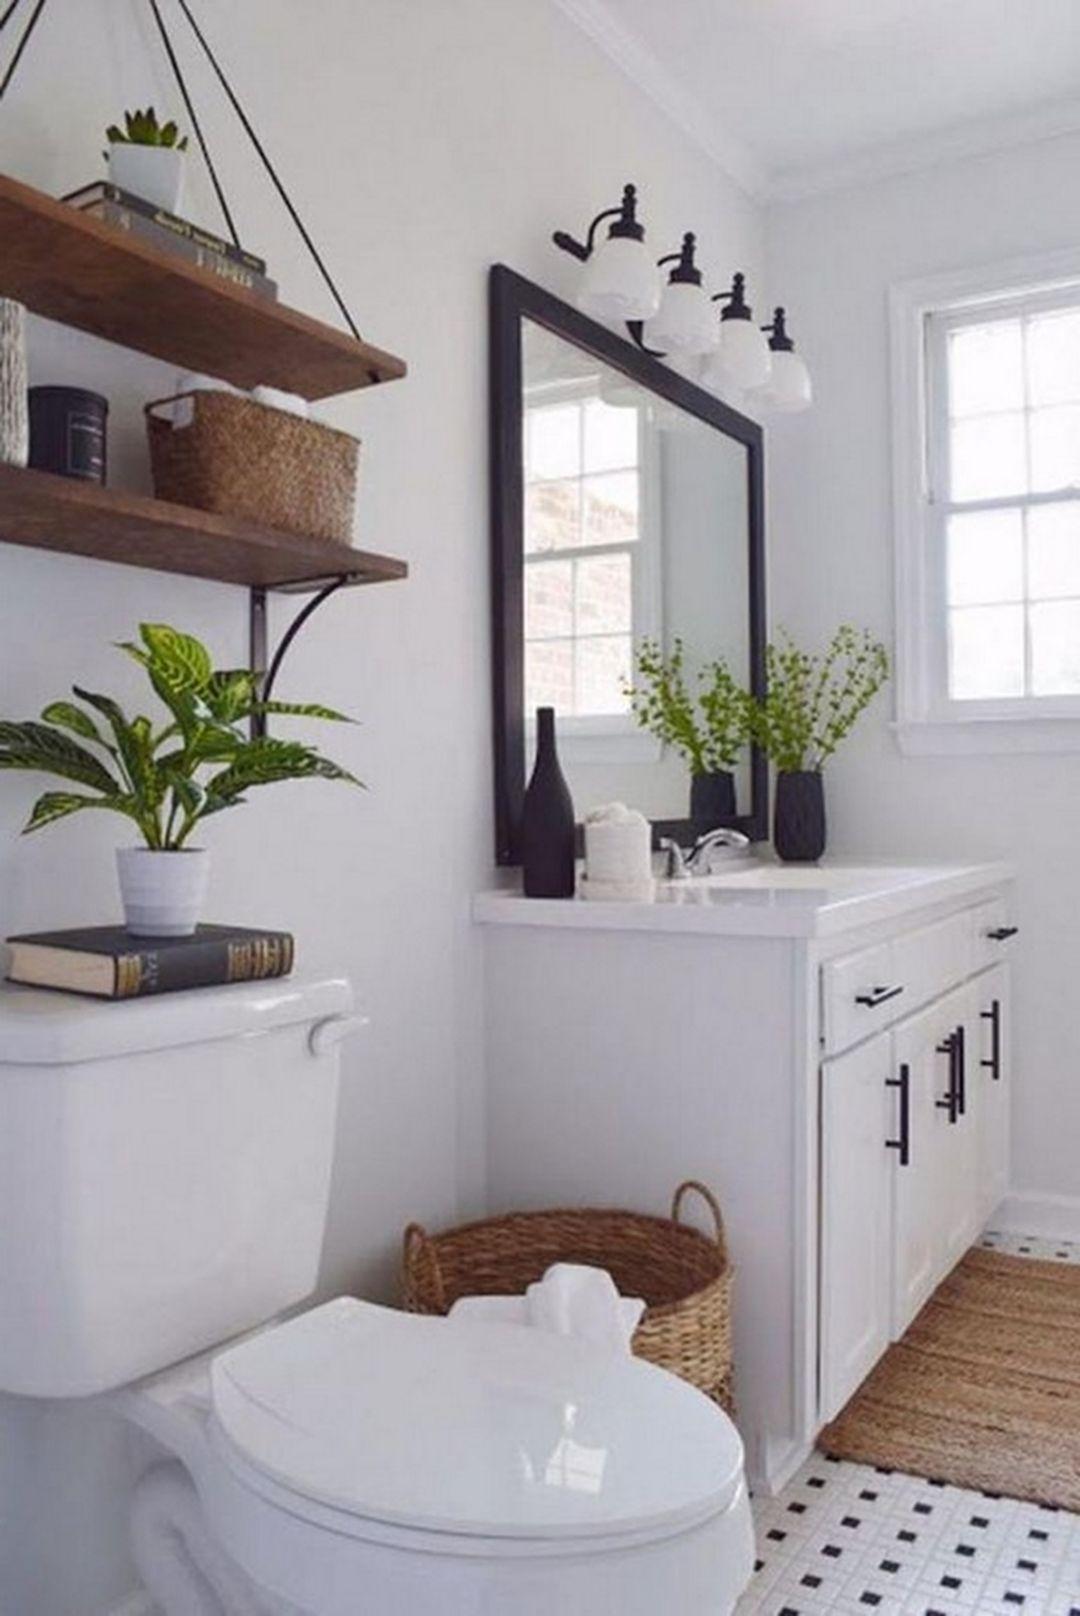 15 Charming Rustic Farmhouse Master Bathroom For Remodel Ideas Farmhouse Master Bathroom Rustic Master Bathroom Bathrooms Remodel